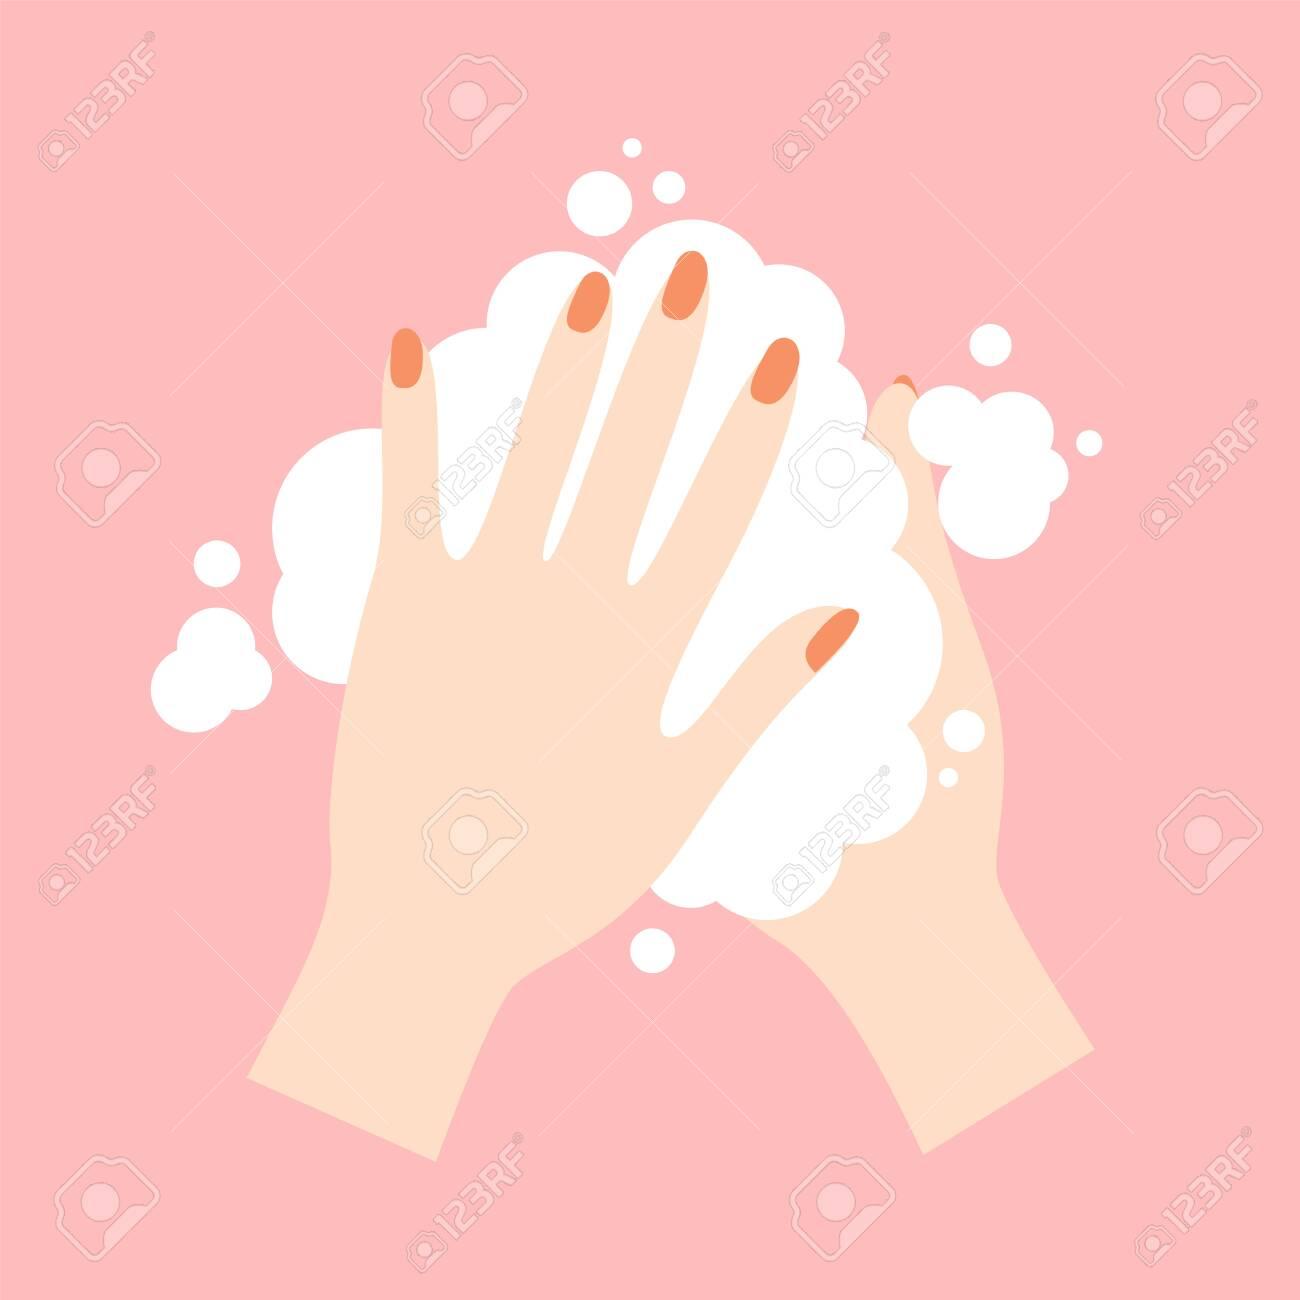 Wash your hands. Cute cartoon vector illustration - 145027573